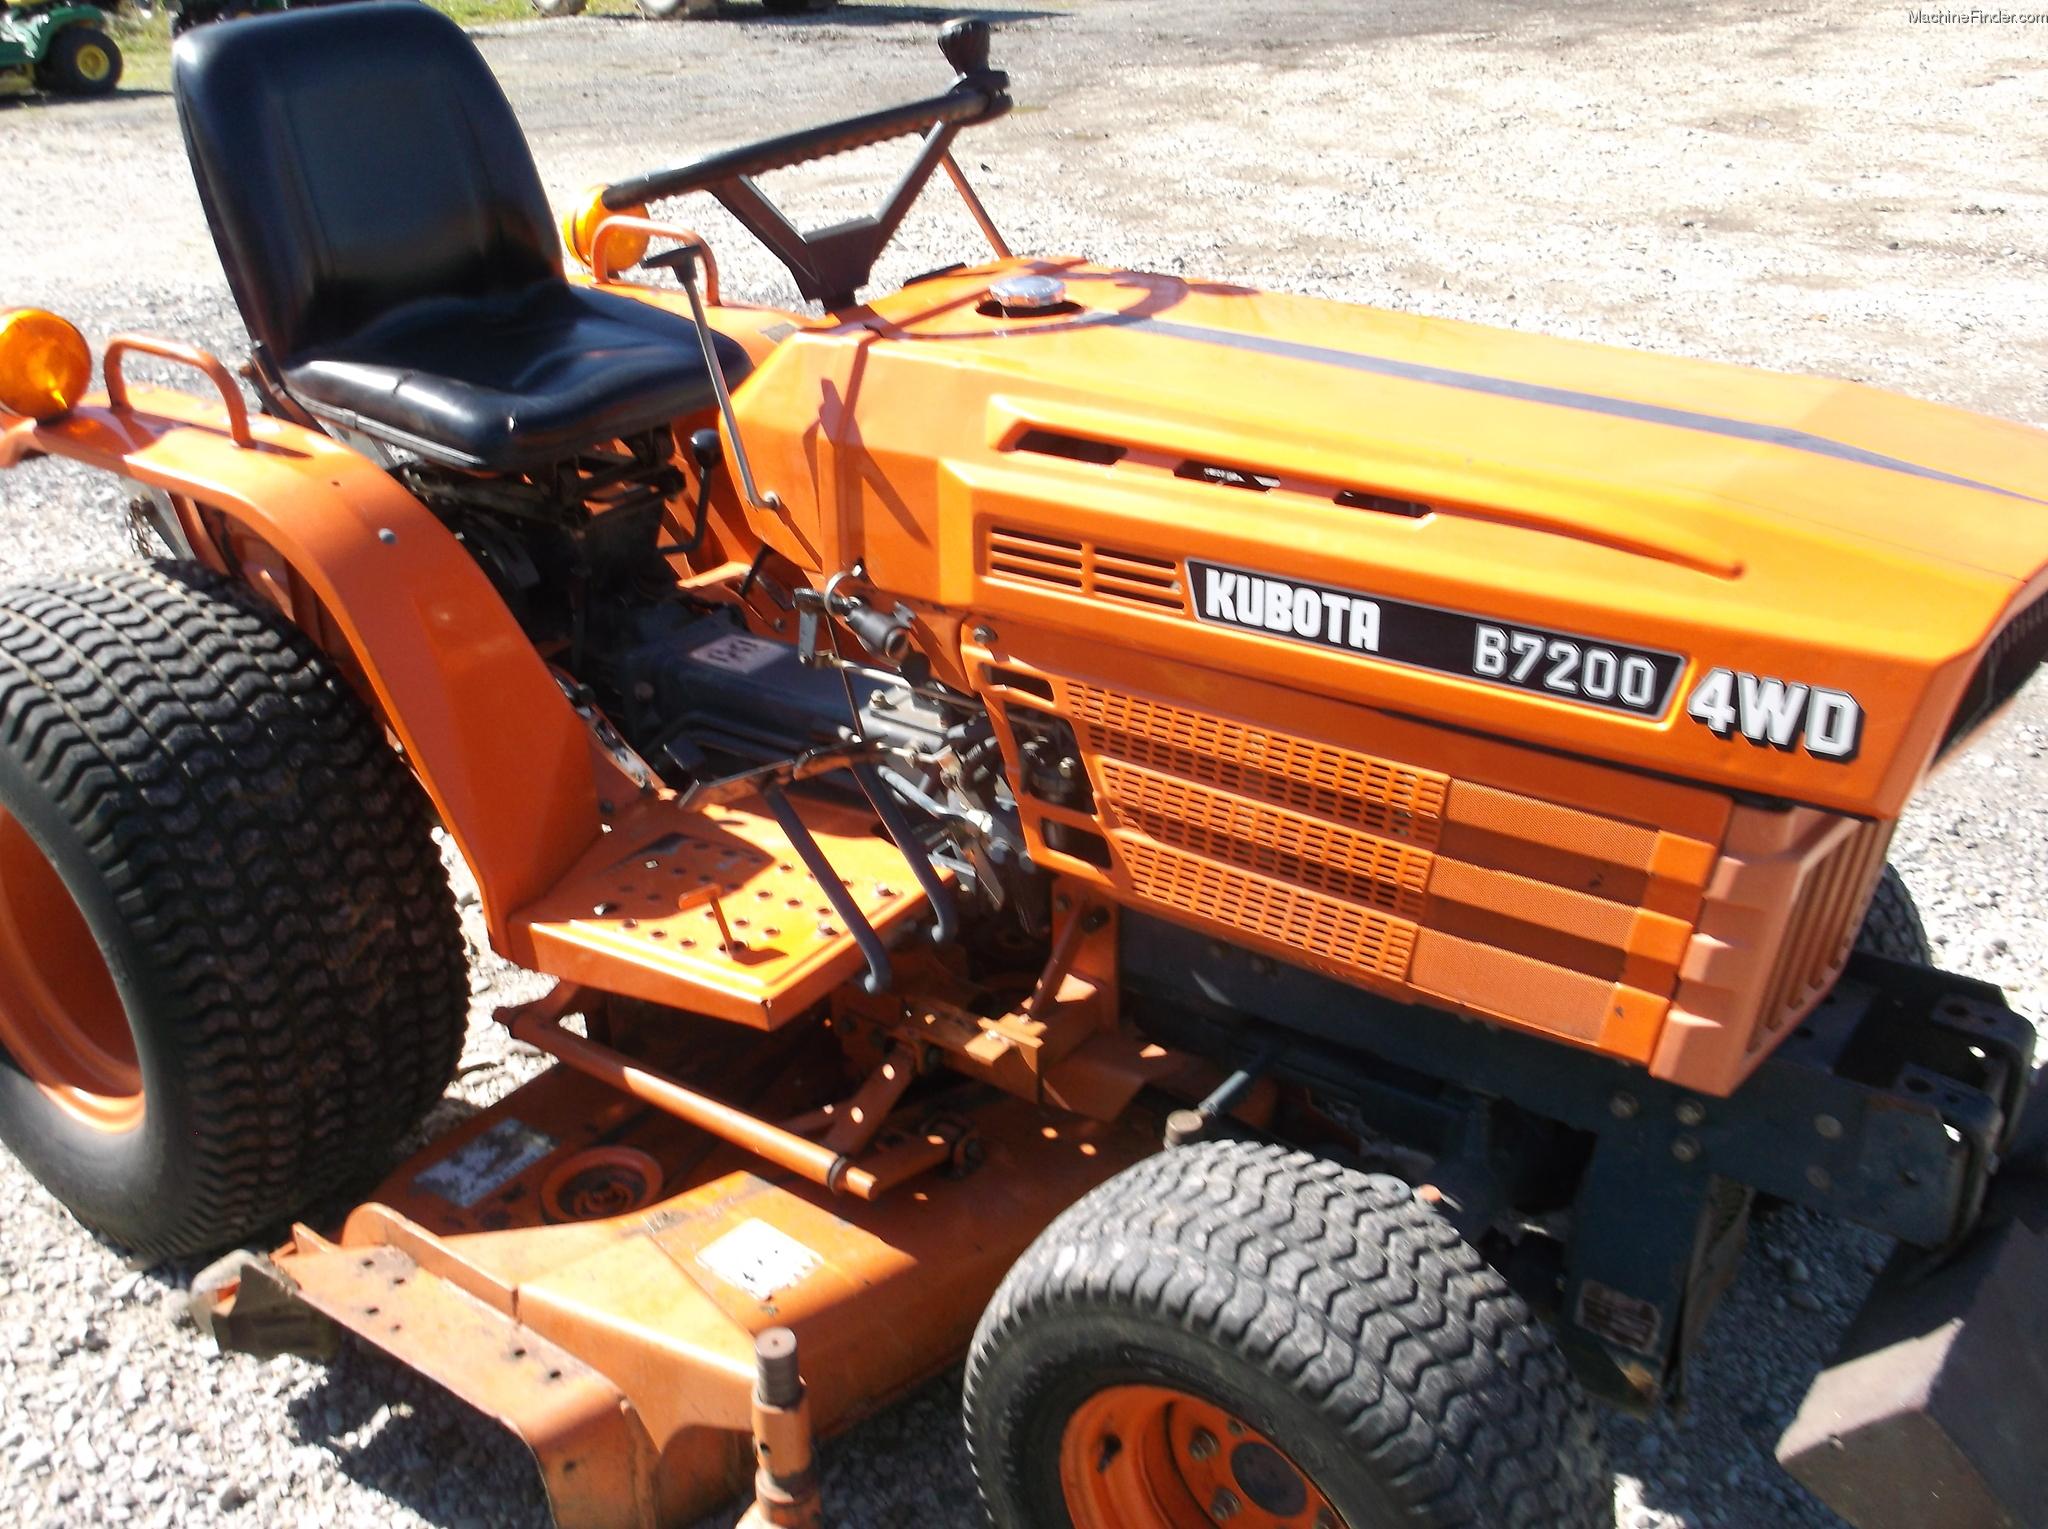 1986 Kubota B7200 Tractors Compact 1 40hp John